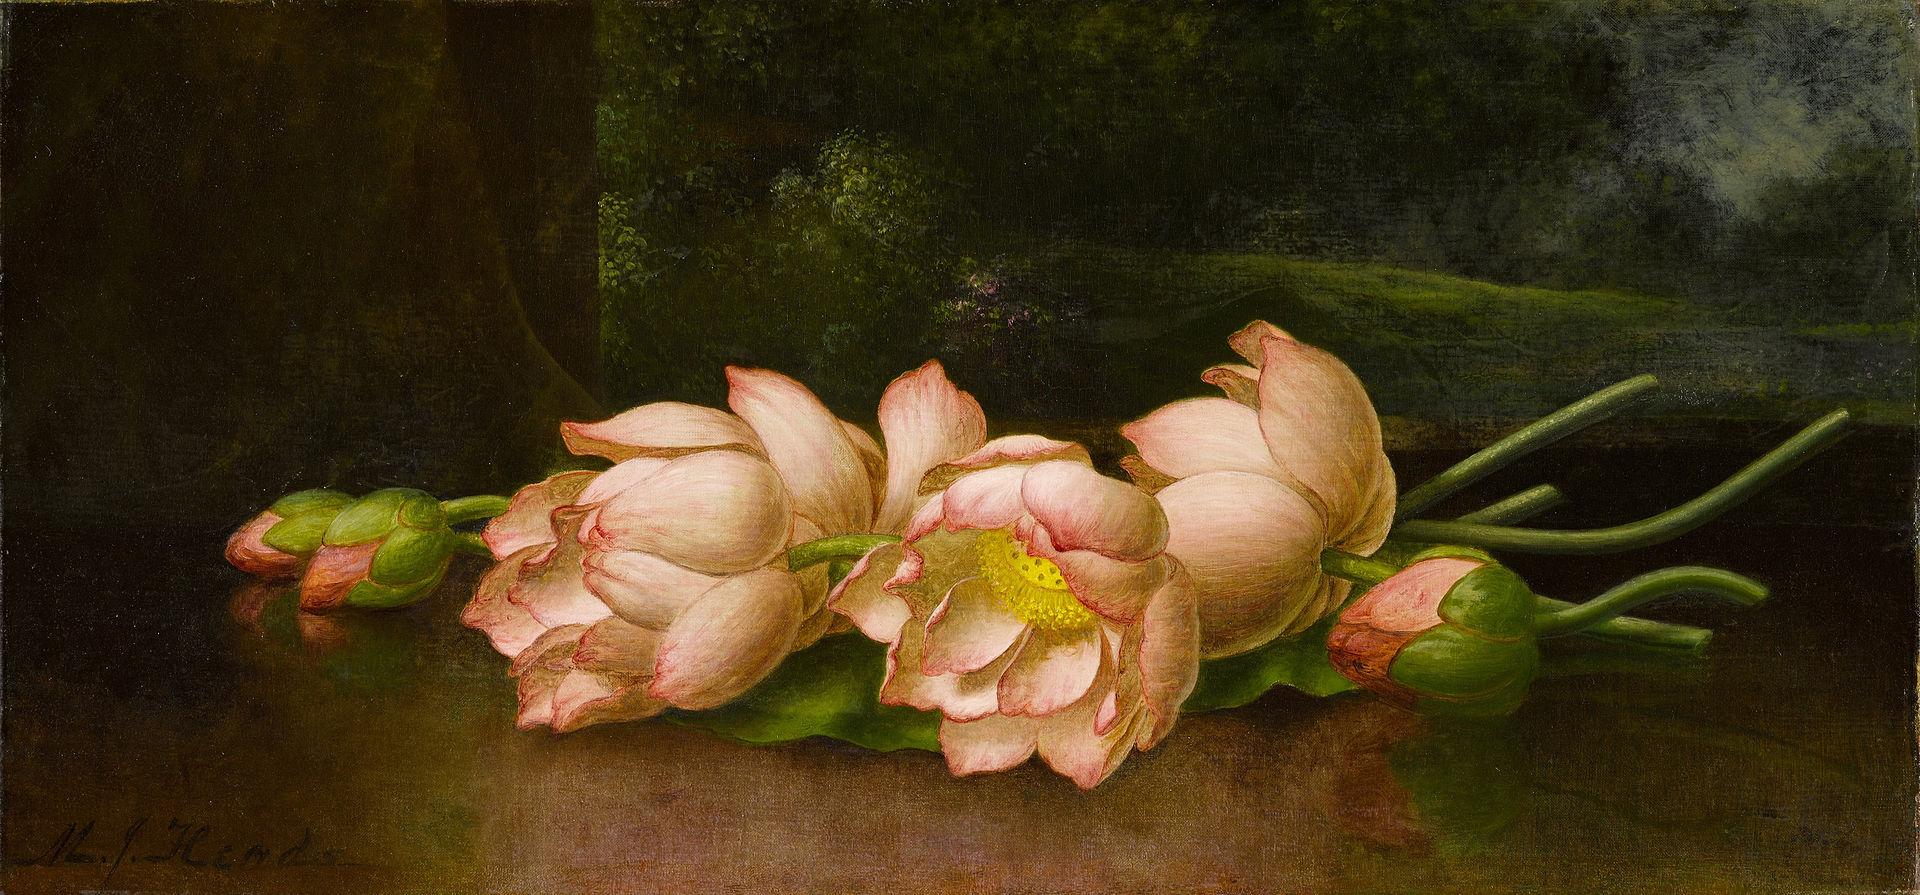 Цветы лотоса - Пейзажная картина на заднем плане - Мартин Джонсон Хид - Google Cultural Institute.jpg